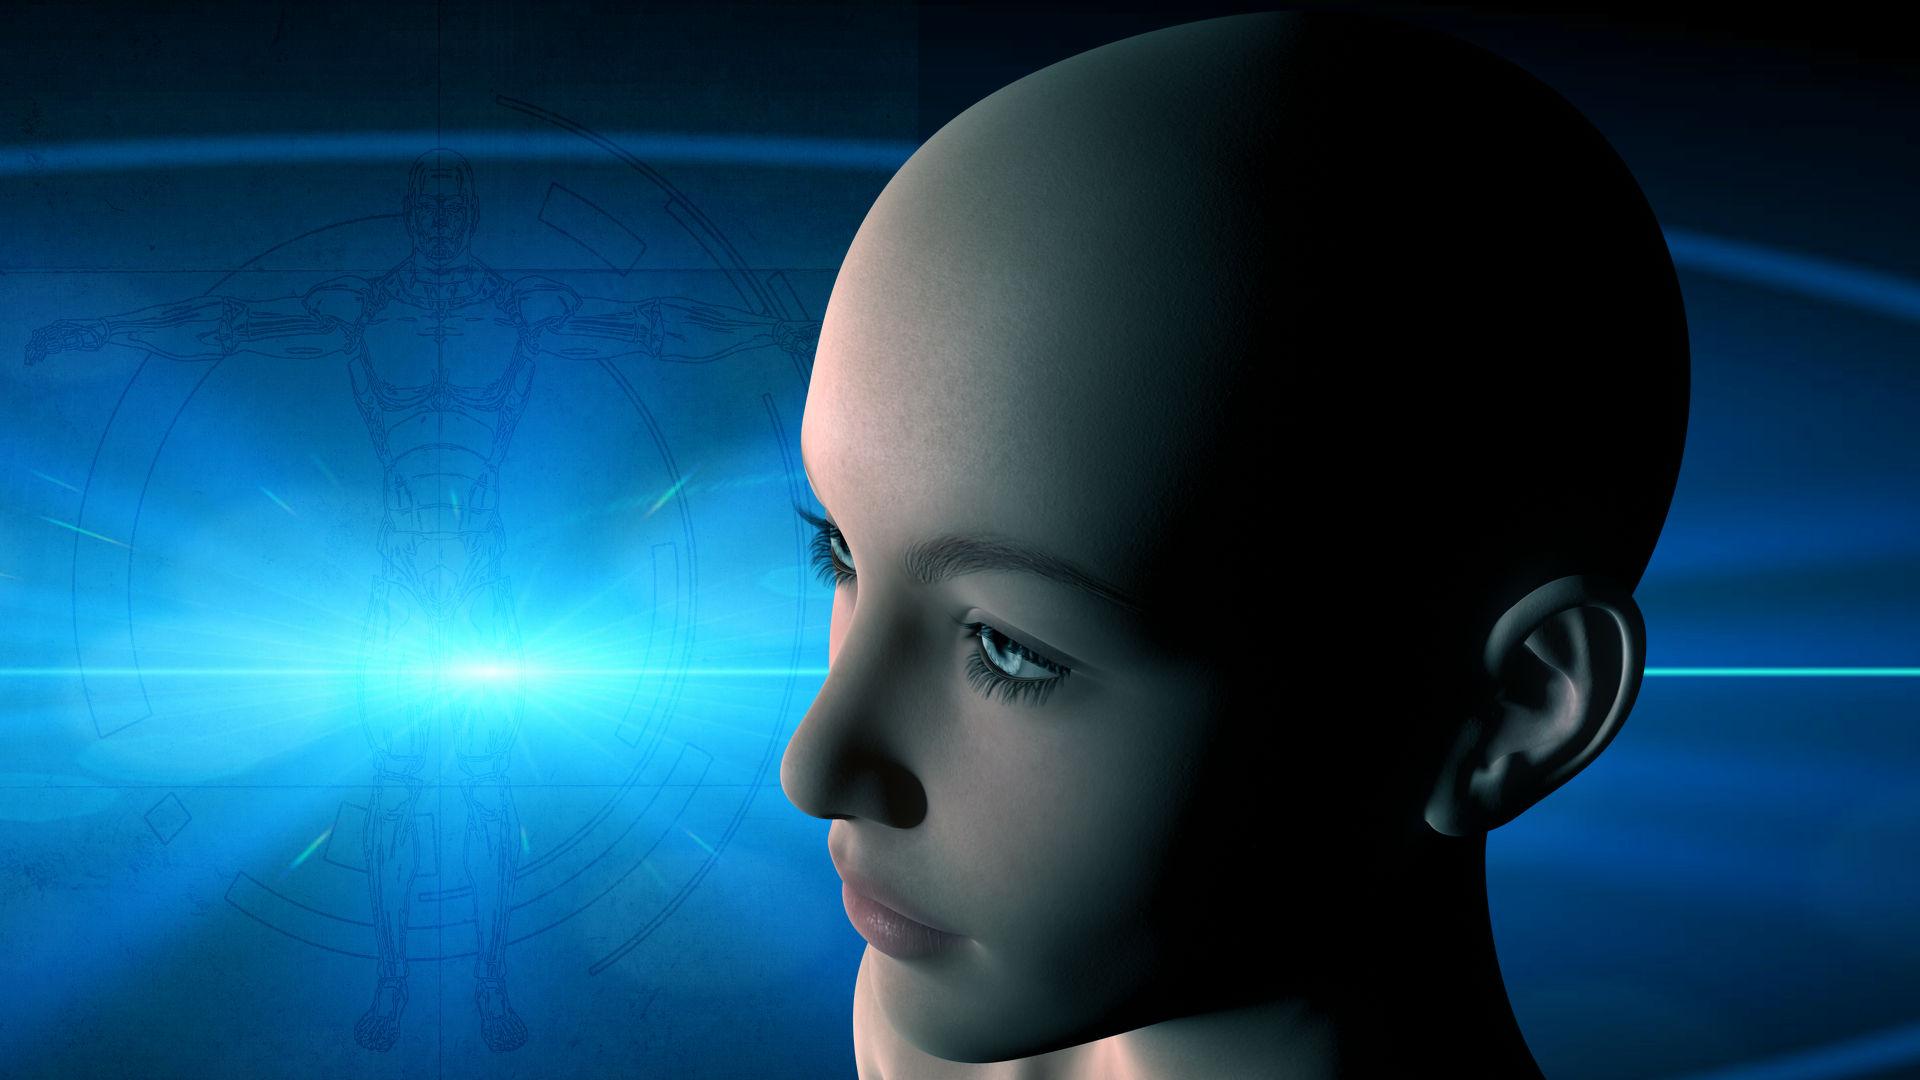 The Future, 3drender, Artificial, Digital, Face, HQ Photo